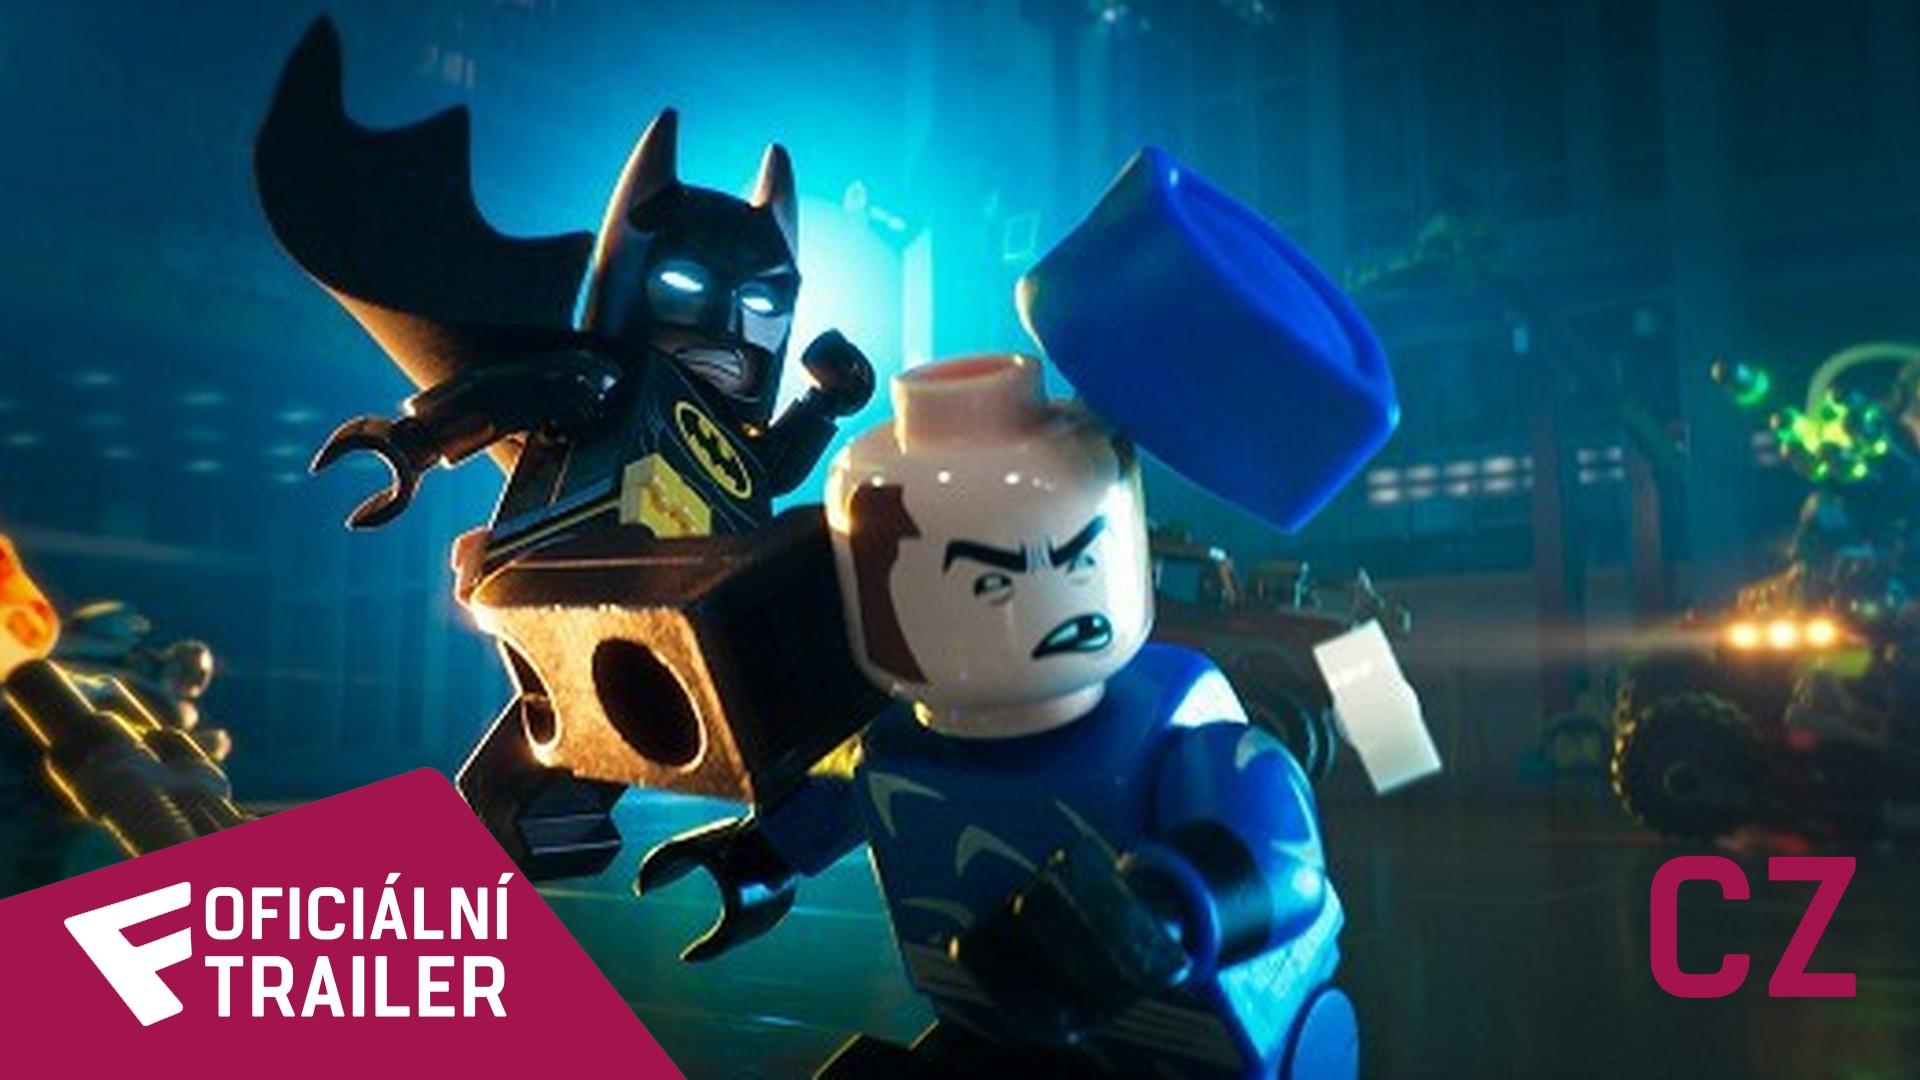 LEGO® Batman film - Oficiální Trailer (CZ - dabing) | Fandíme filmu